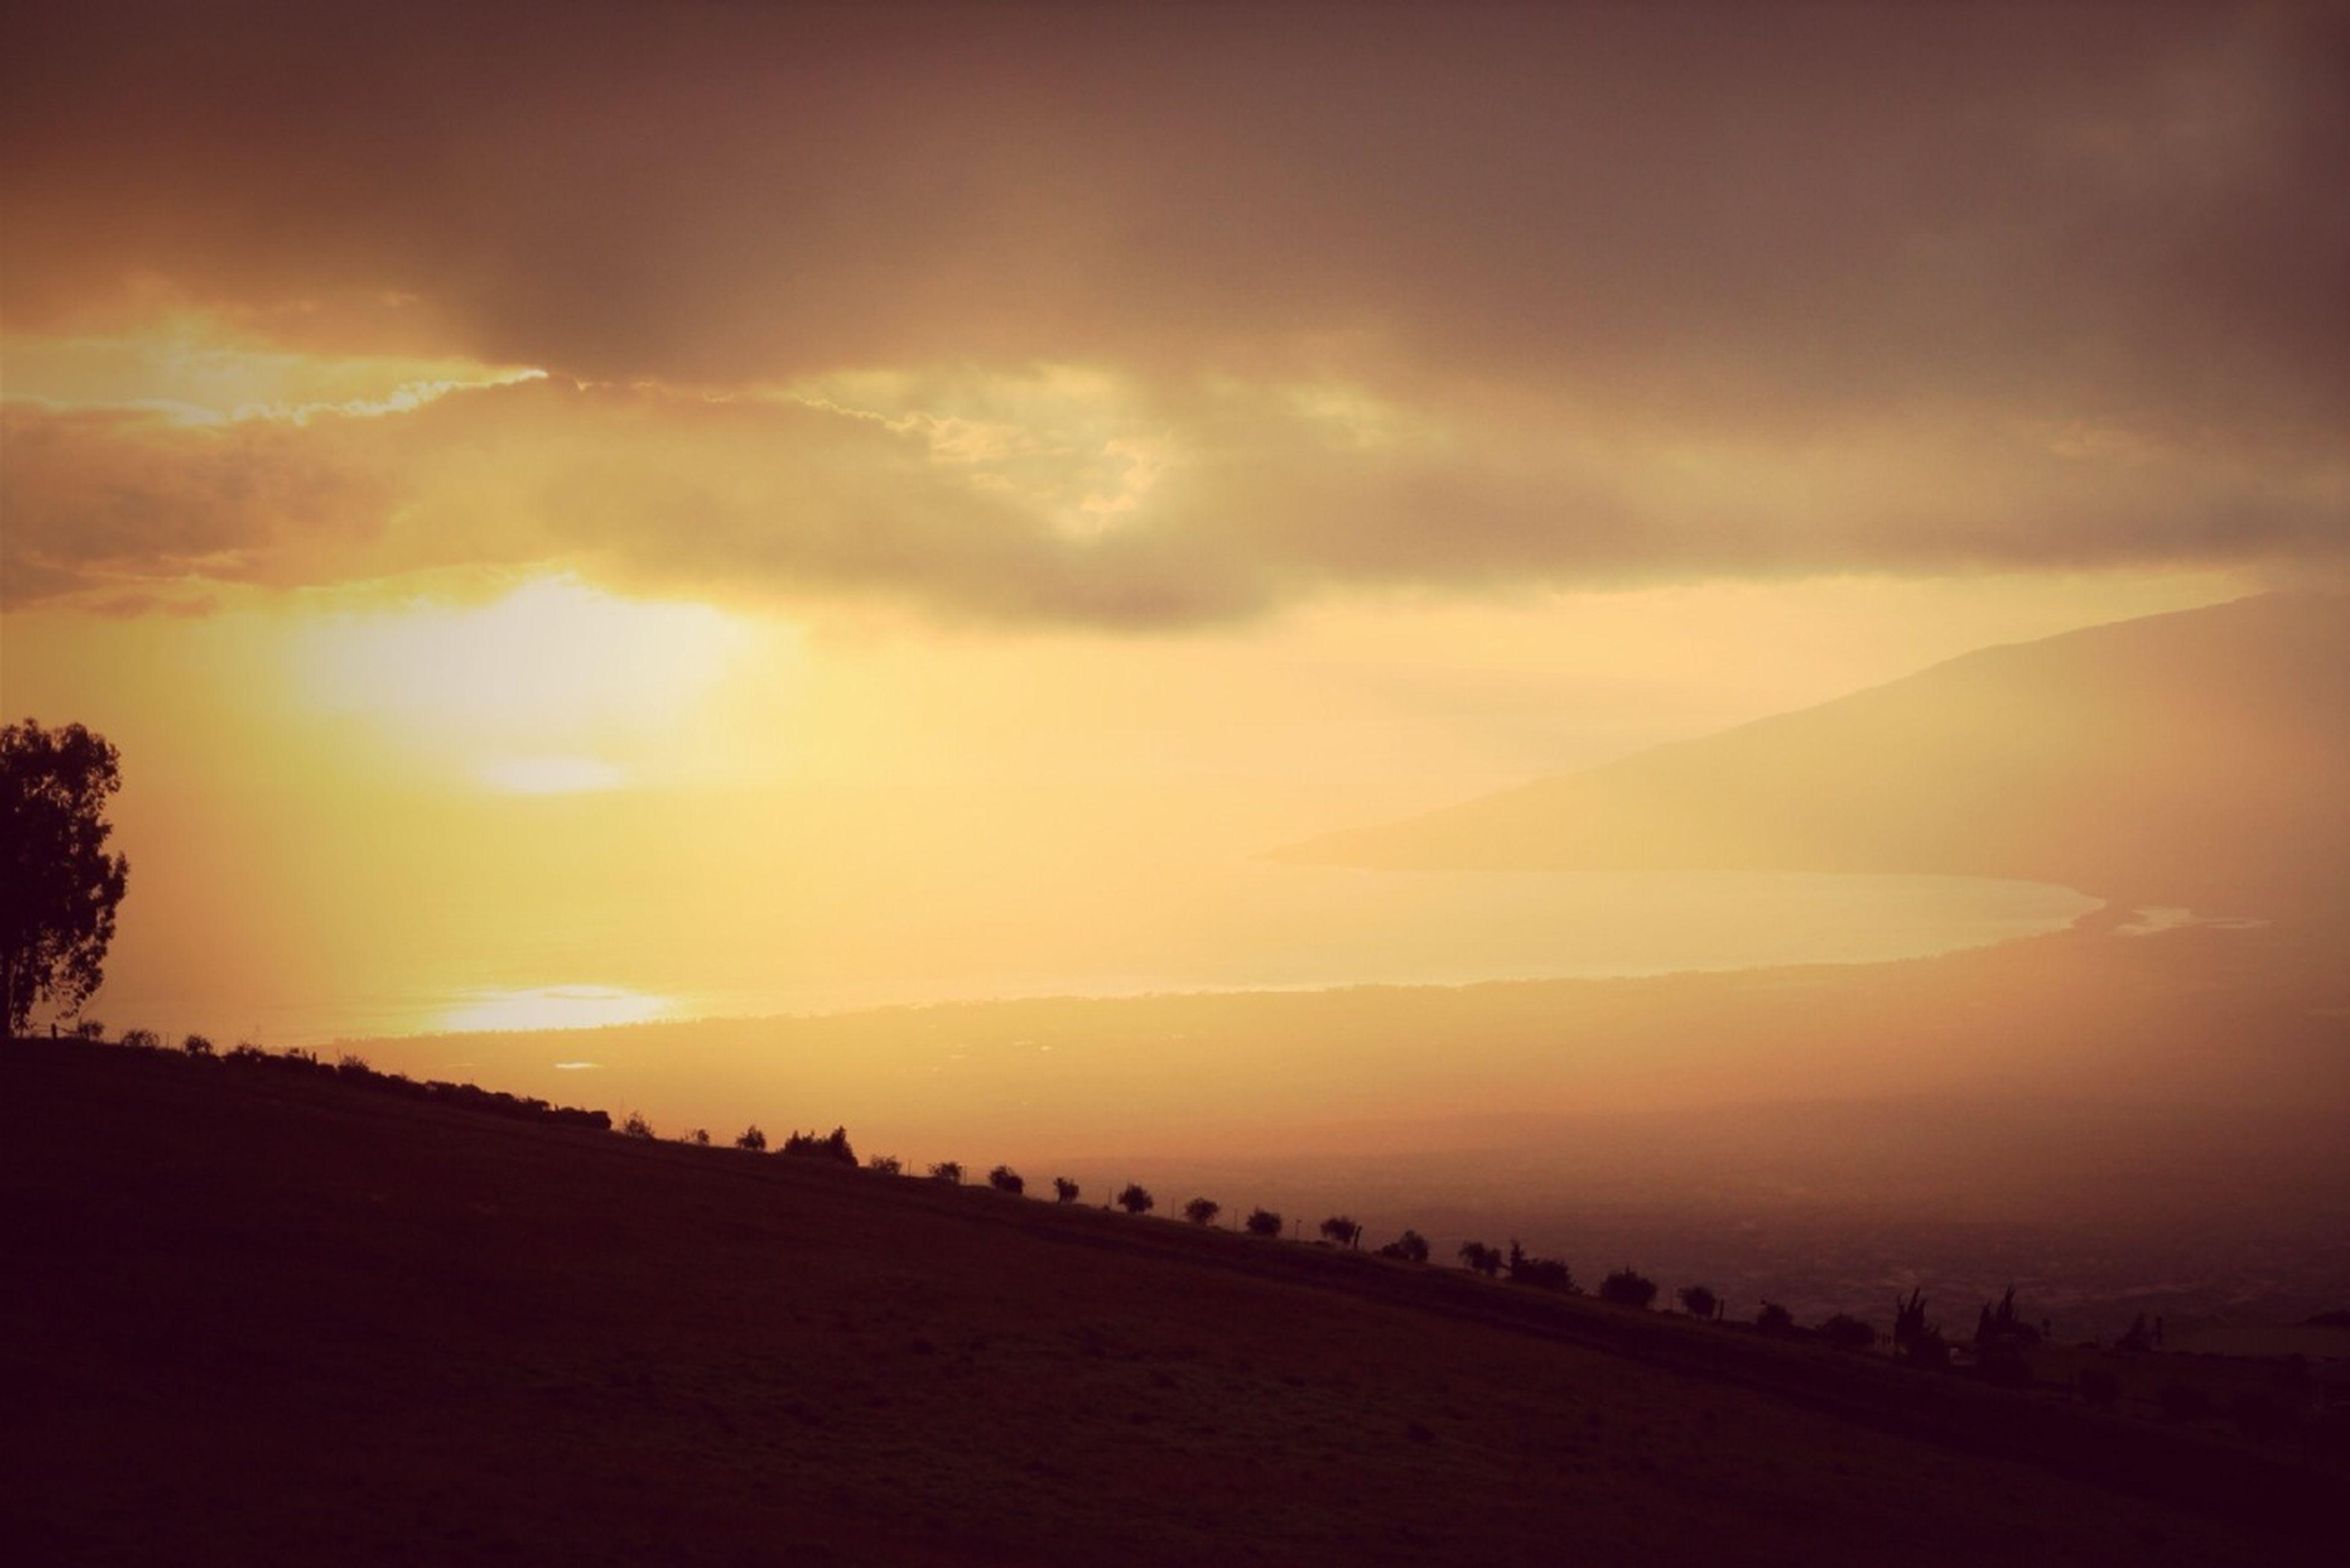 sunset, tranquil scene, scenics, silhouette, tranquility, sky, beauty in nature, landscape, orange color, nature, idyllic, cloud - sky, non-urban scene, cloud, horizon over land, outdoors, sun, mountain, remote, sunlight